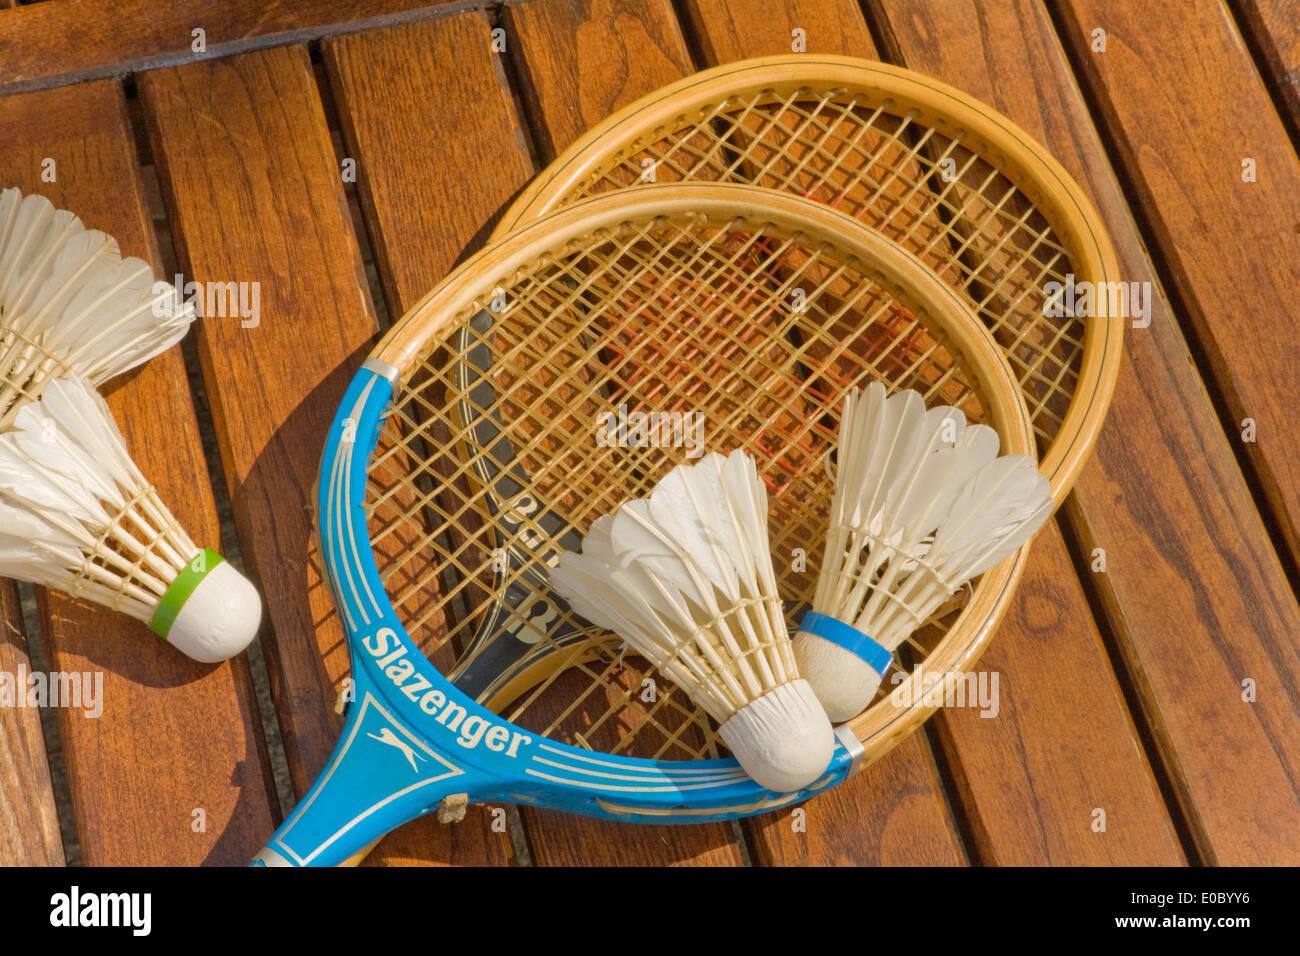 Raquettes de badminton avec volants Banque D'Images